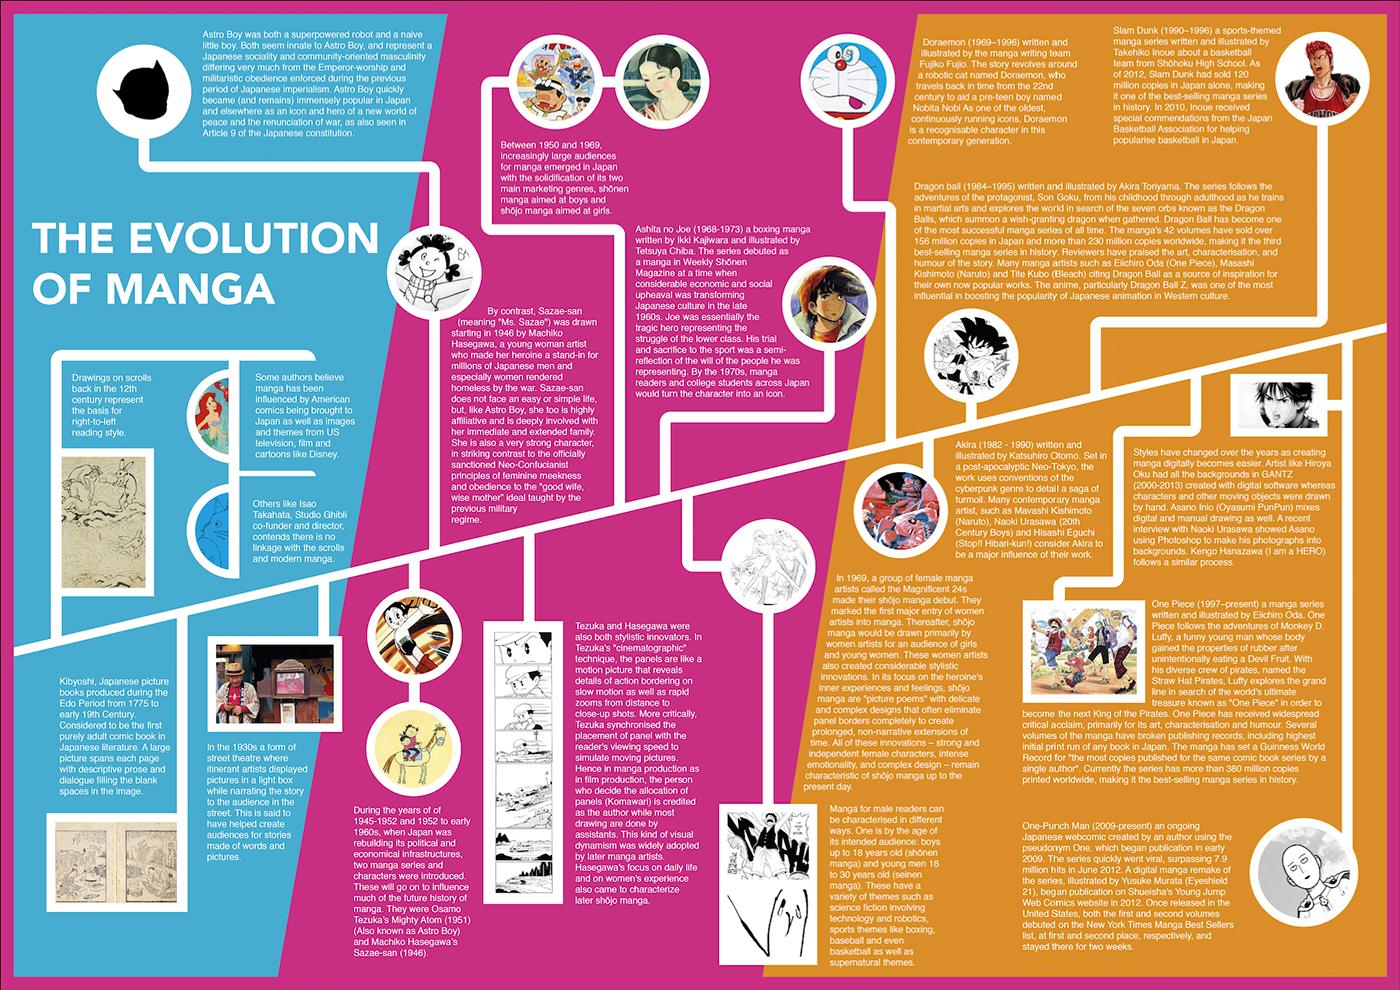 The Evolution of Manga #Infographic